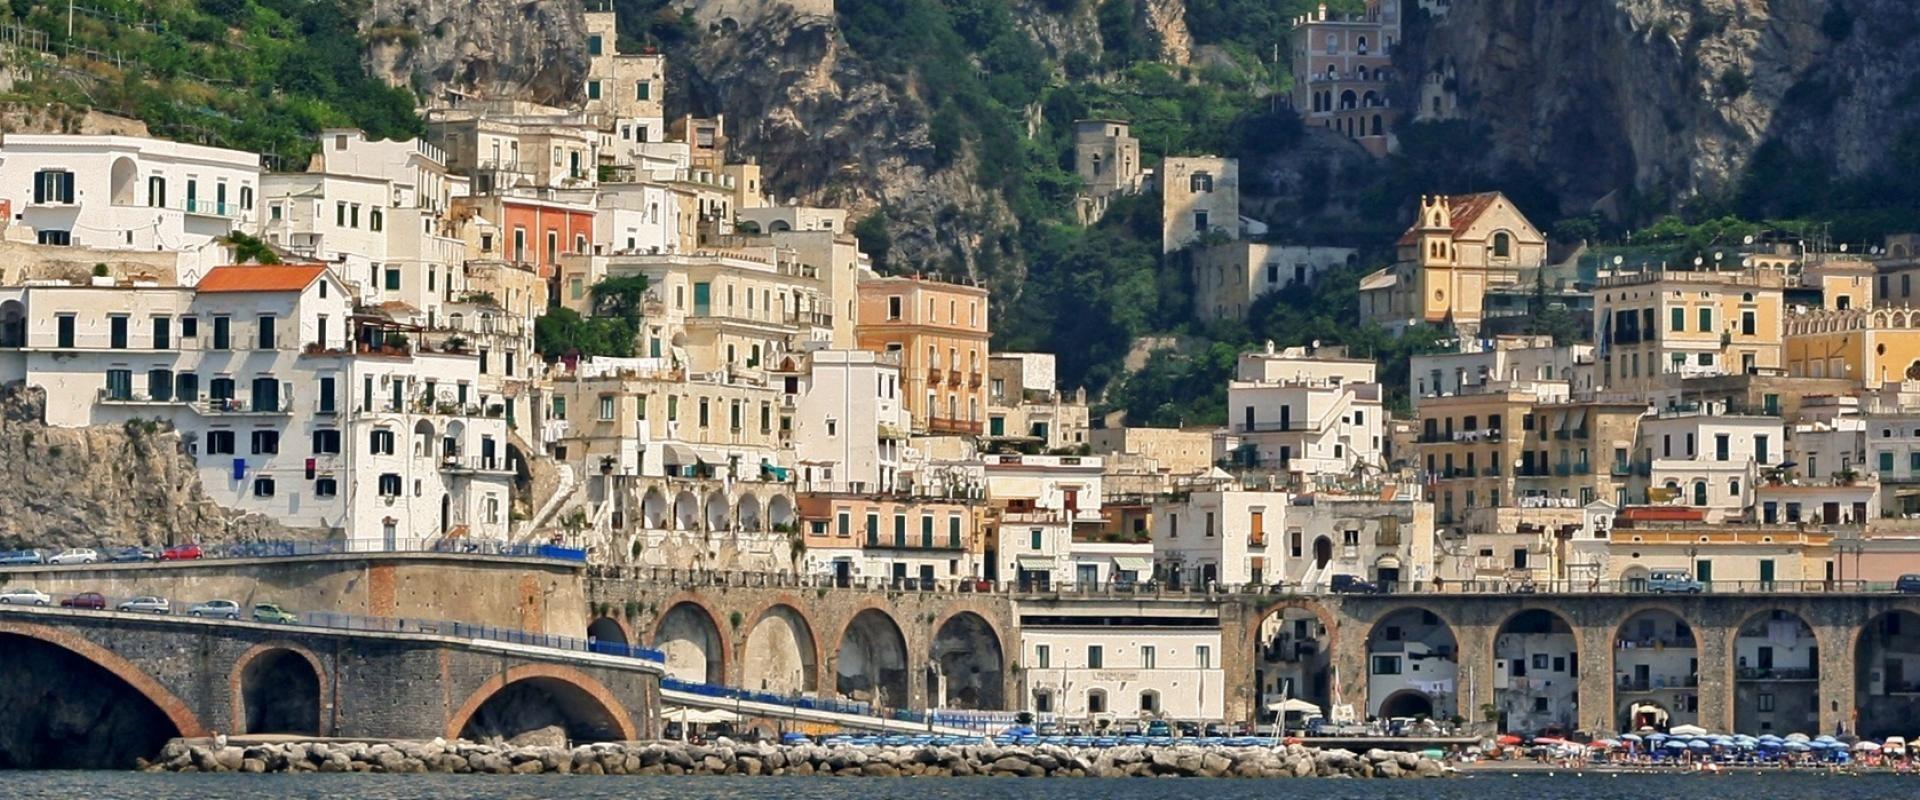 Welcome to Borghi Italia Tour Network | Borghi Italia Tour Network